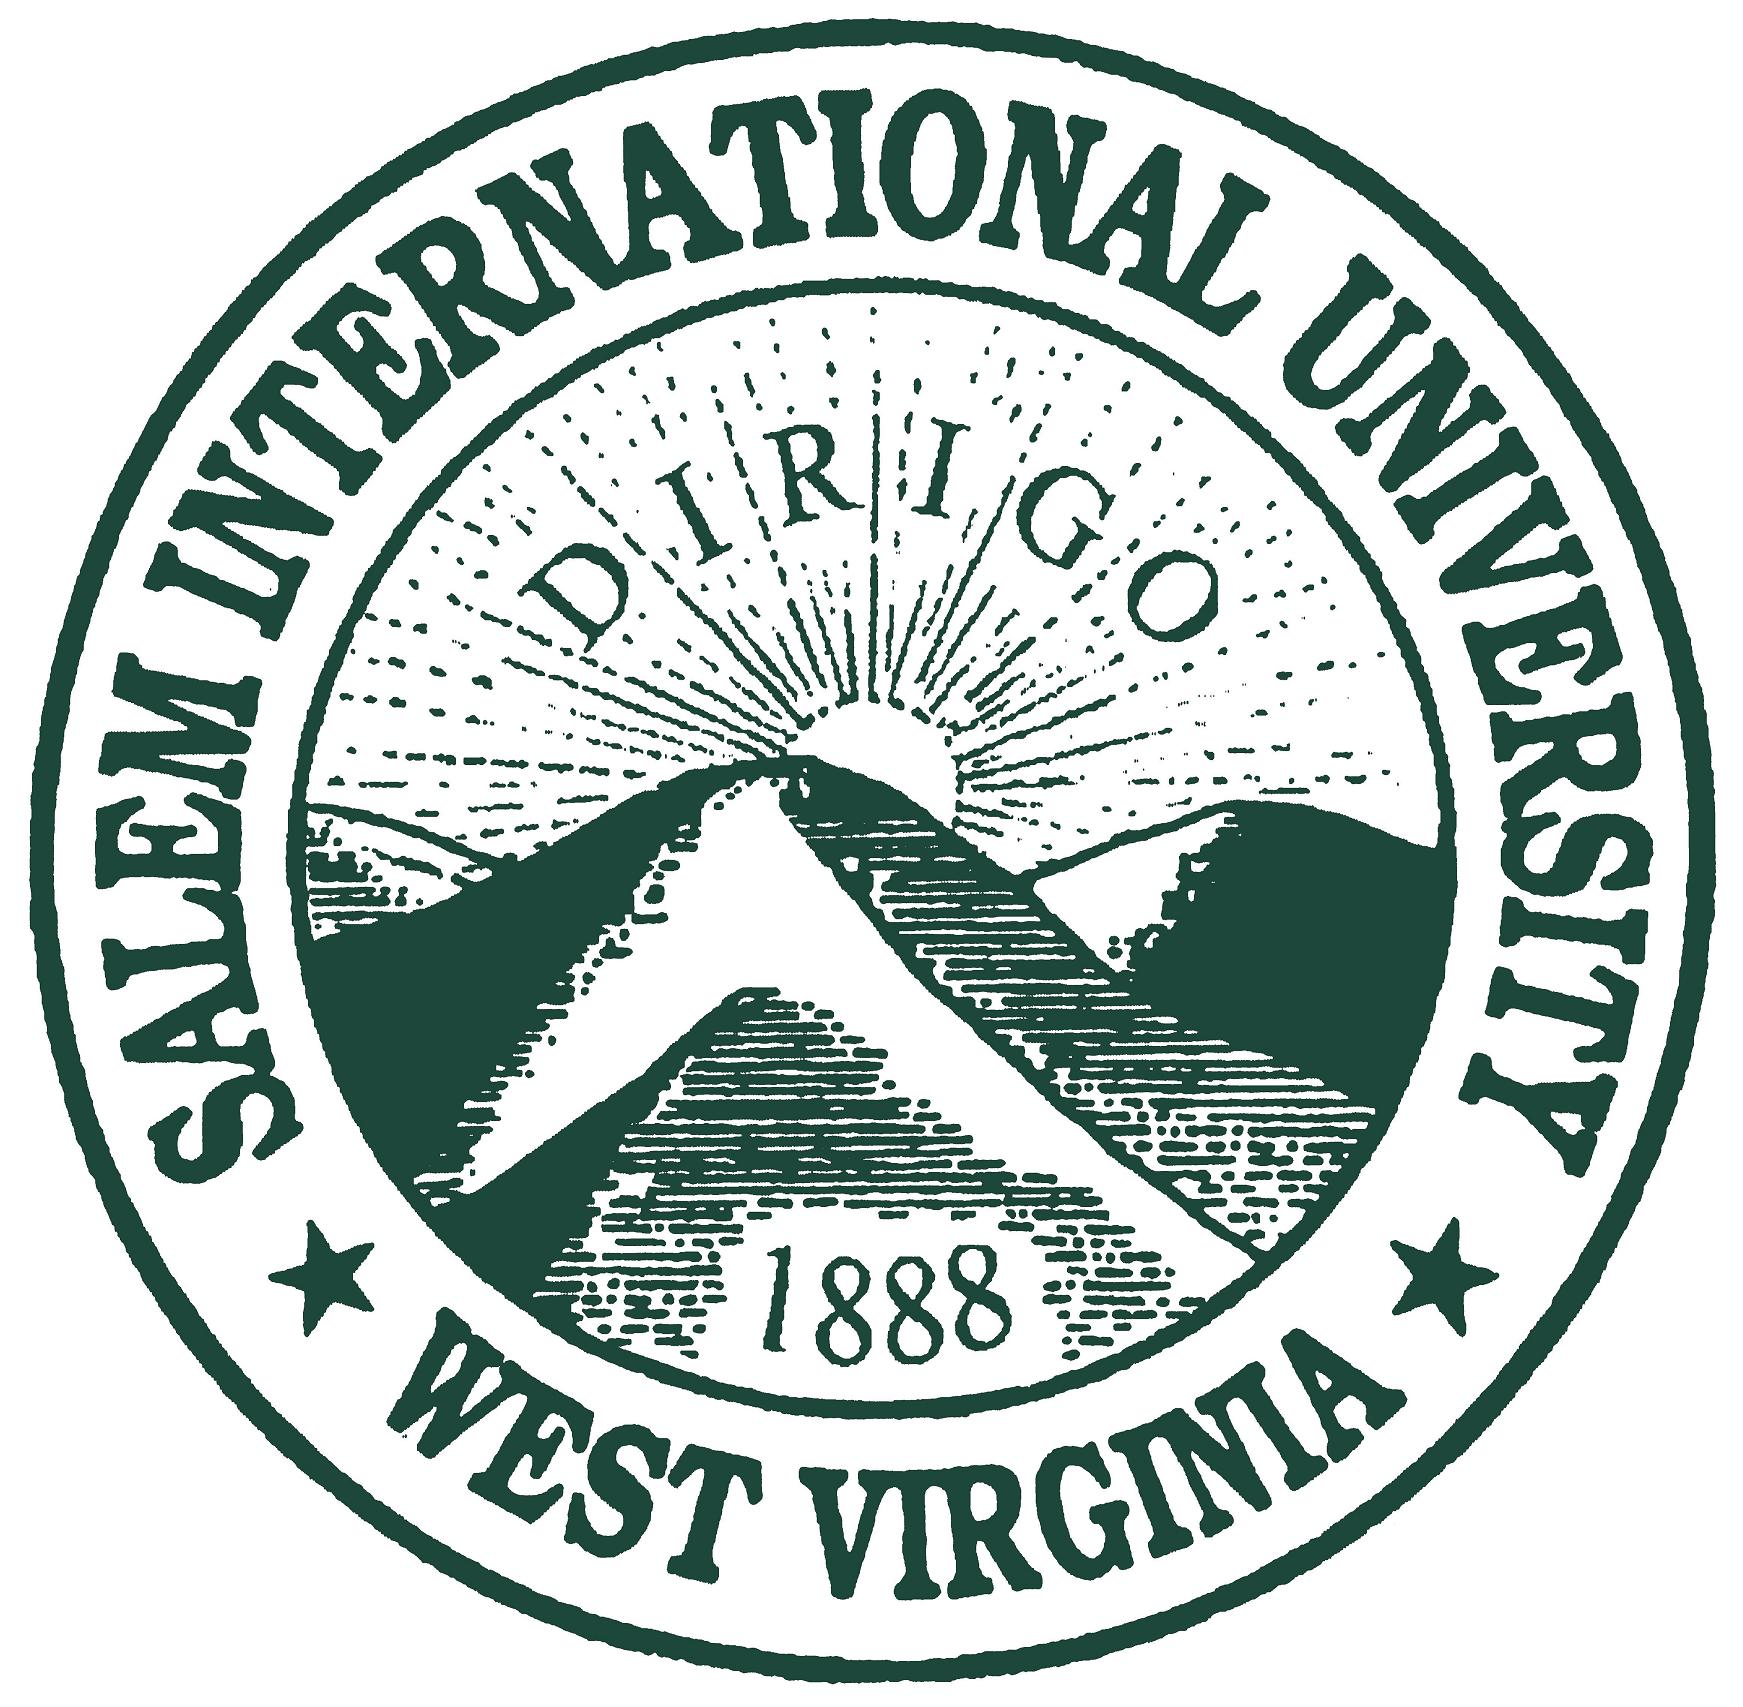 Harrison county chamber of commerces salem international university buycottarizona Image collections